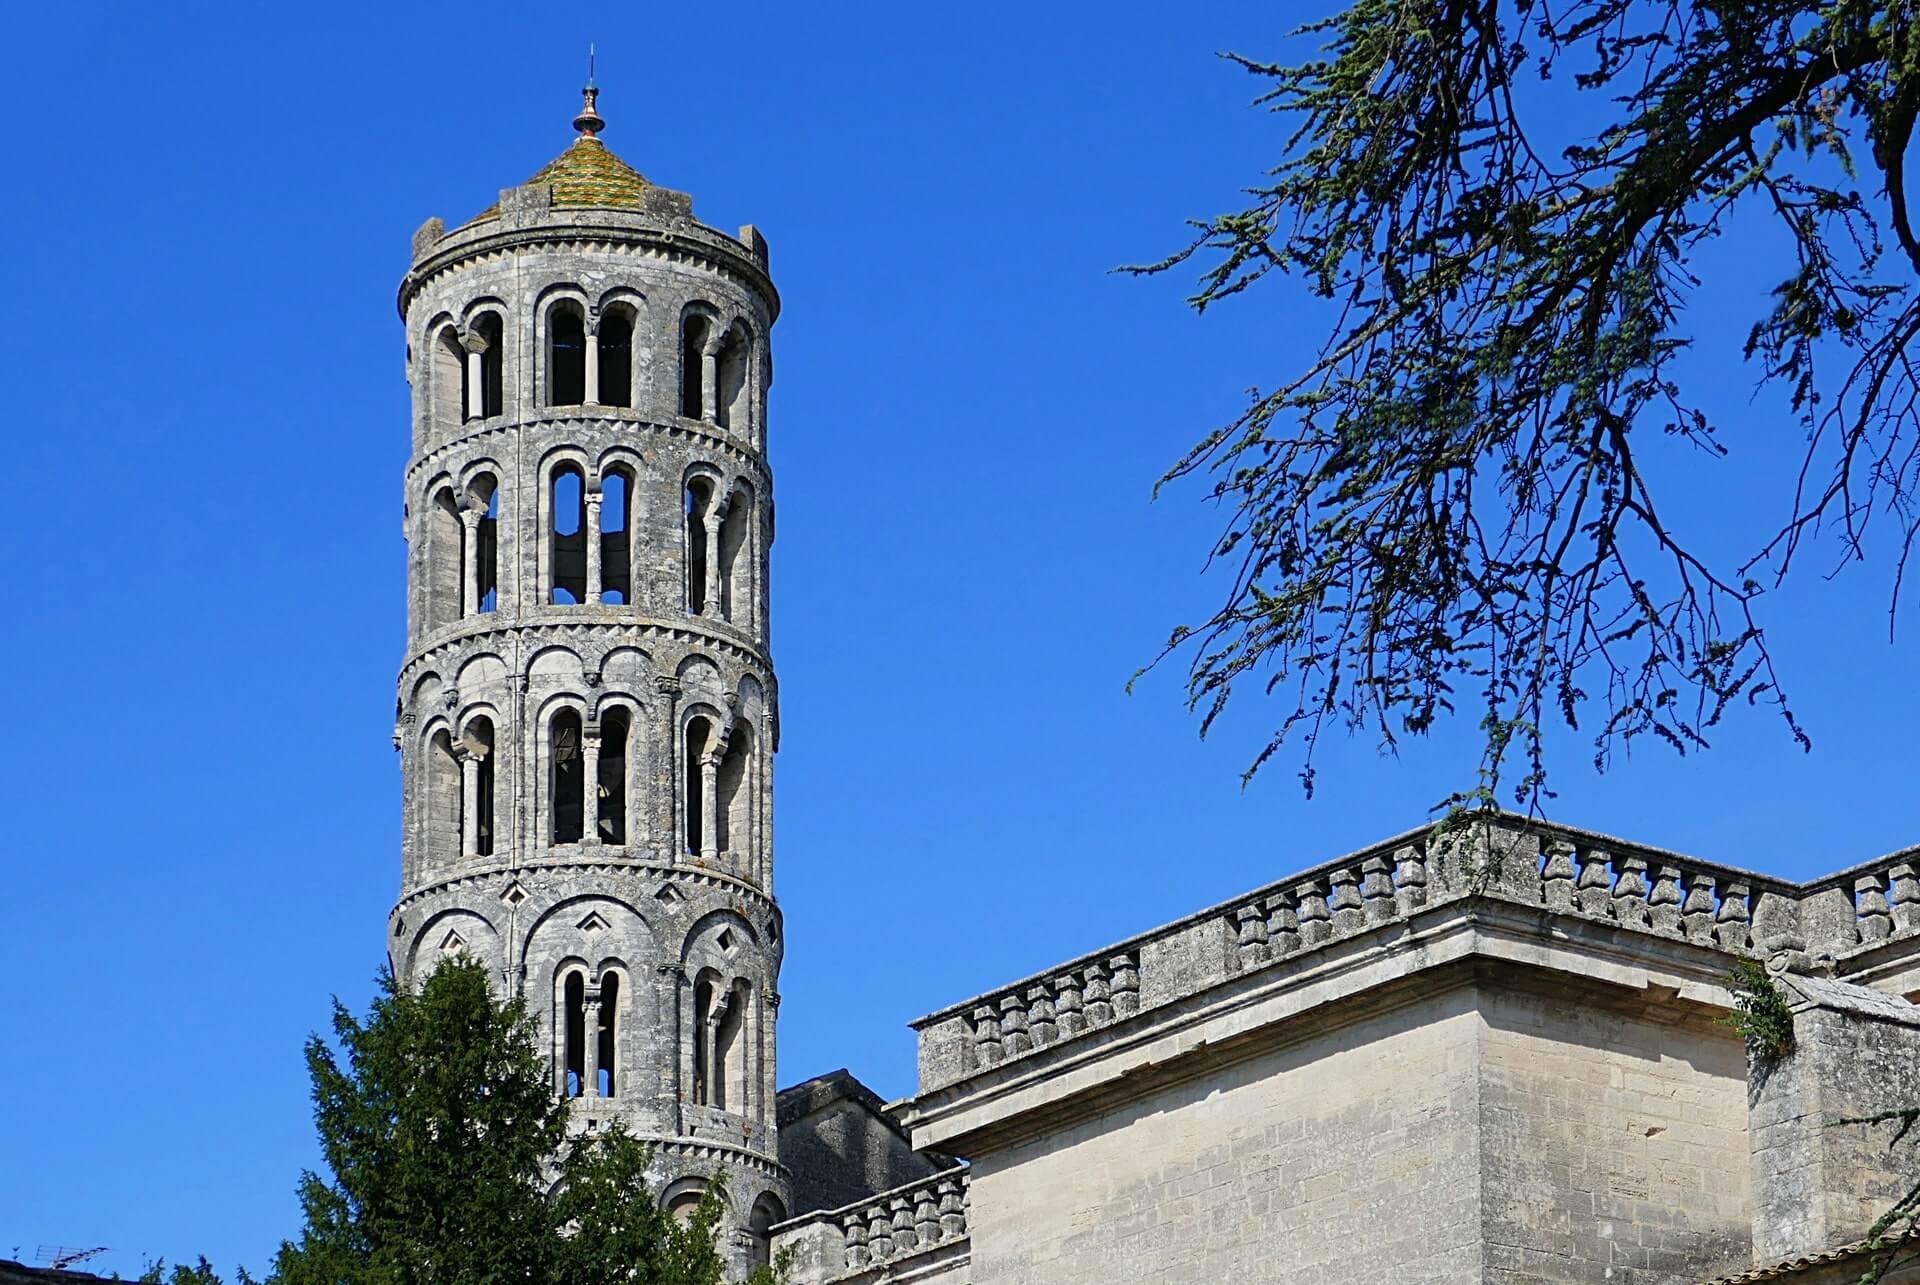 Fenestrelle Turm